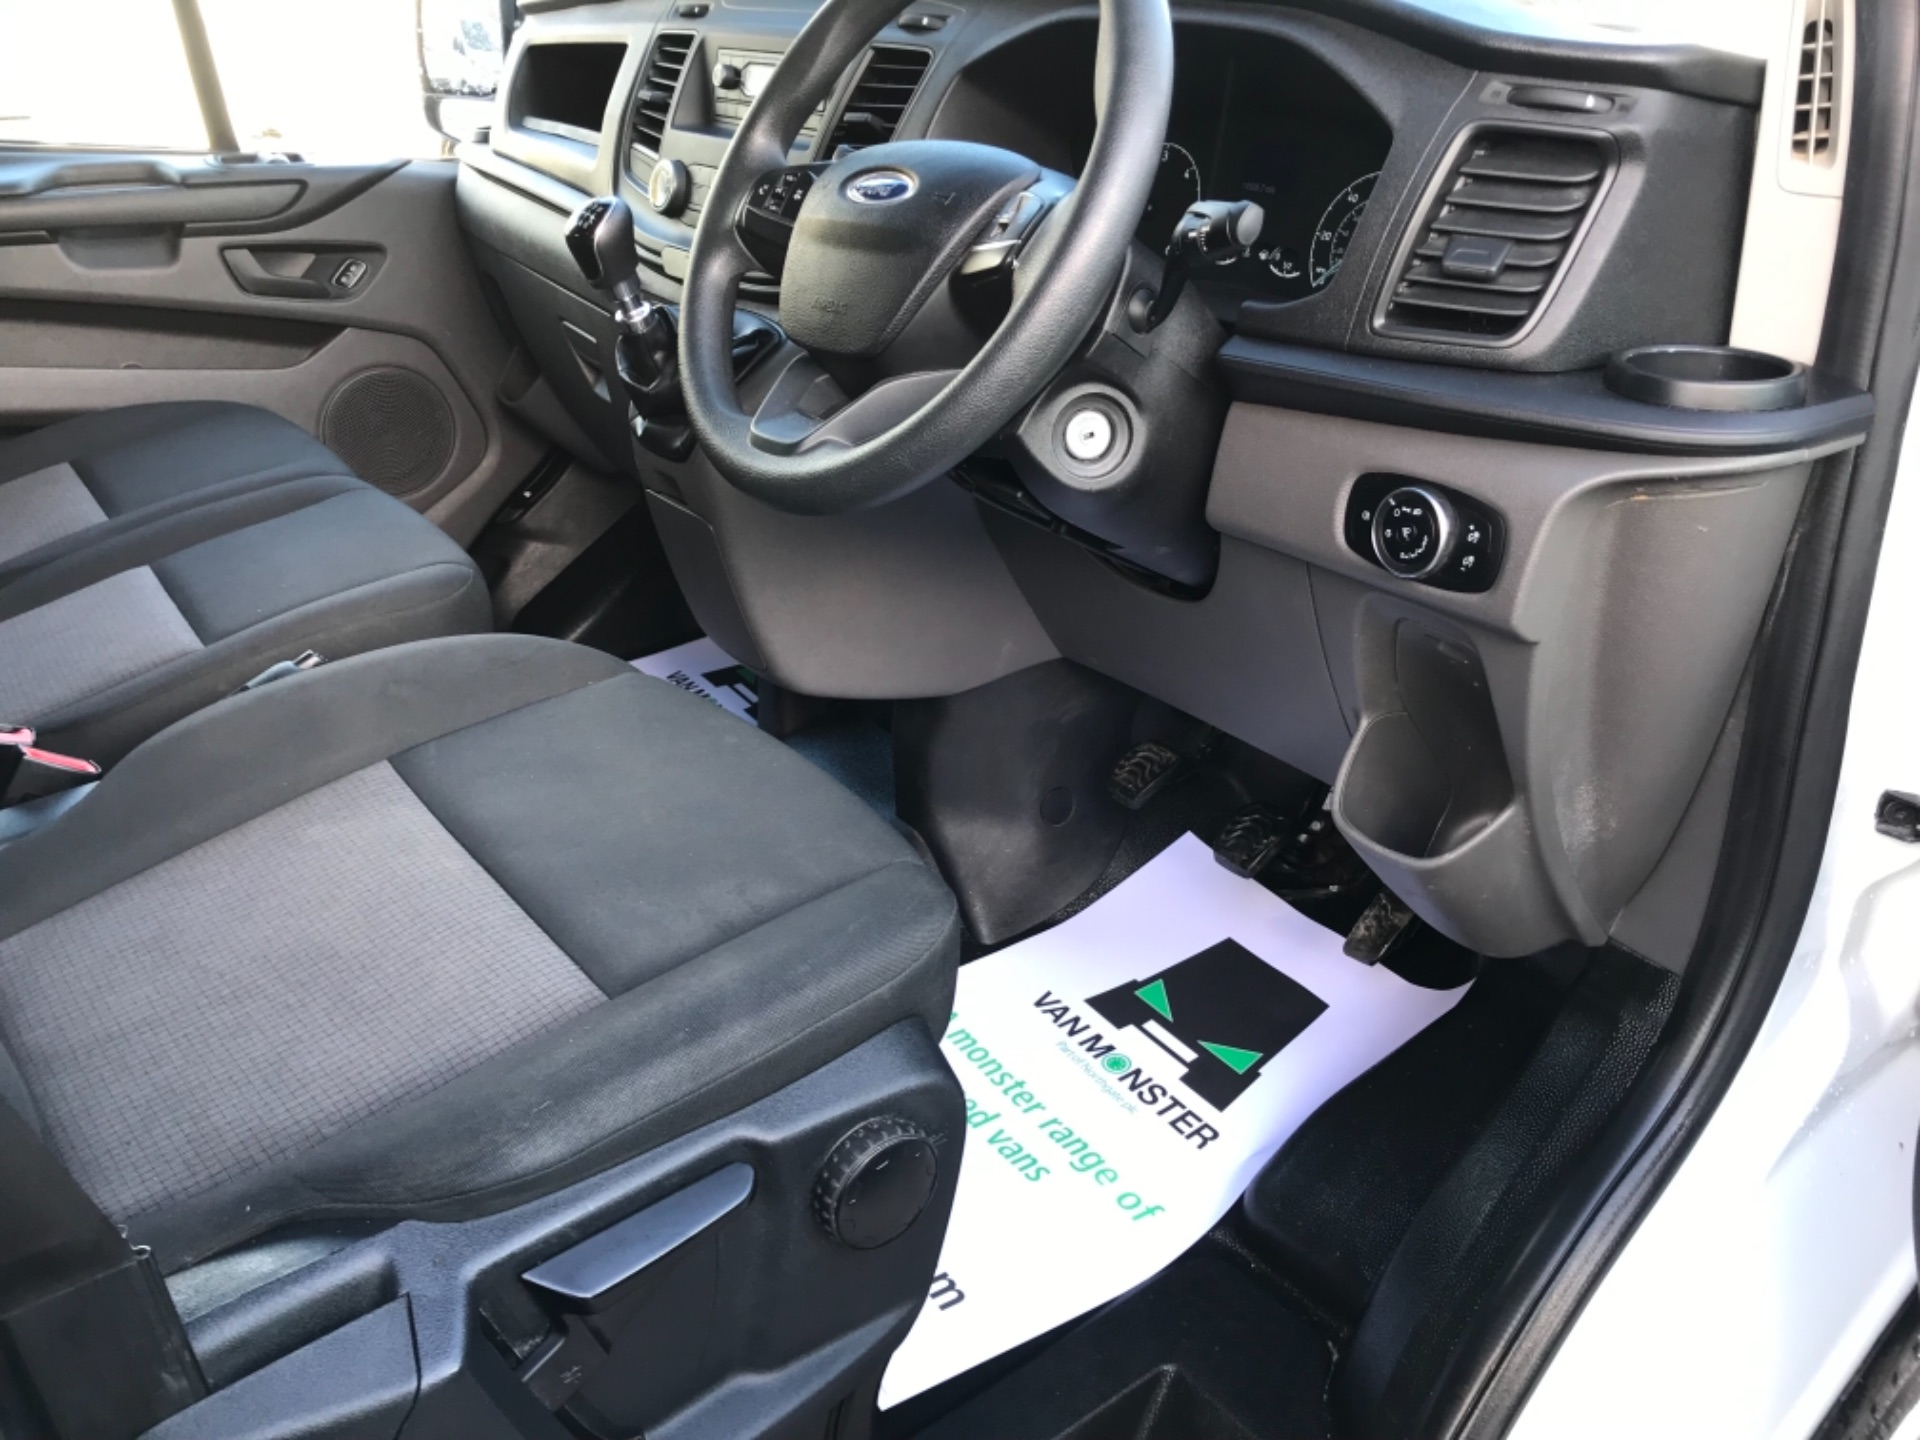 2018 Ford Transit Custom 320 L2 2.0 130ps D/Cab Euro 6 (BK18OLG) Image 8